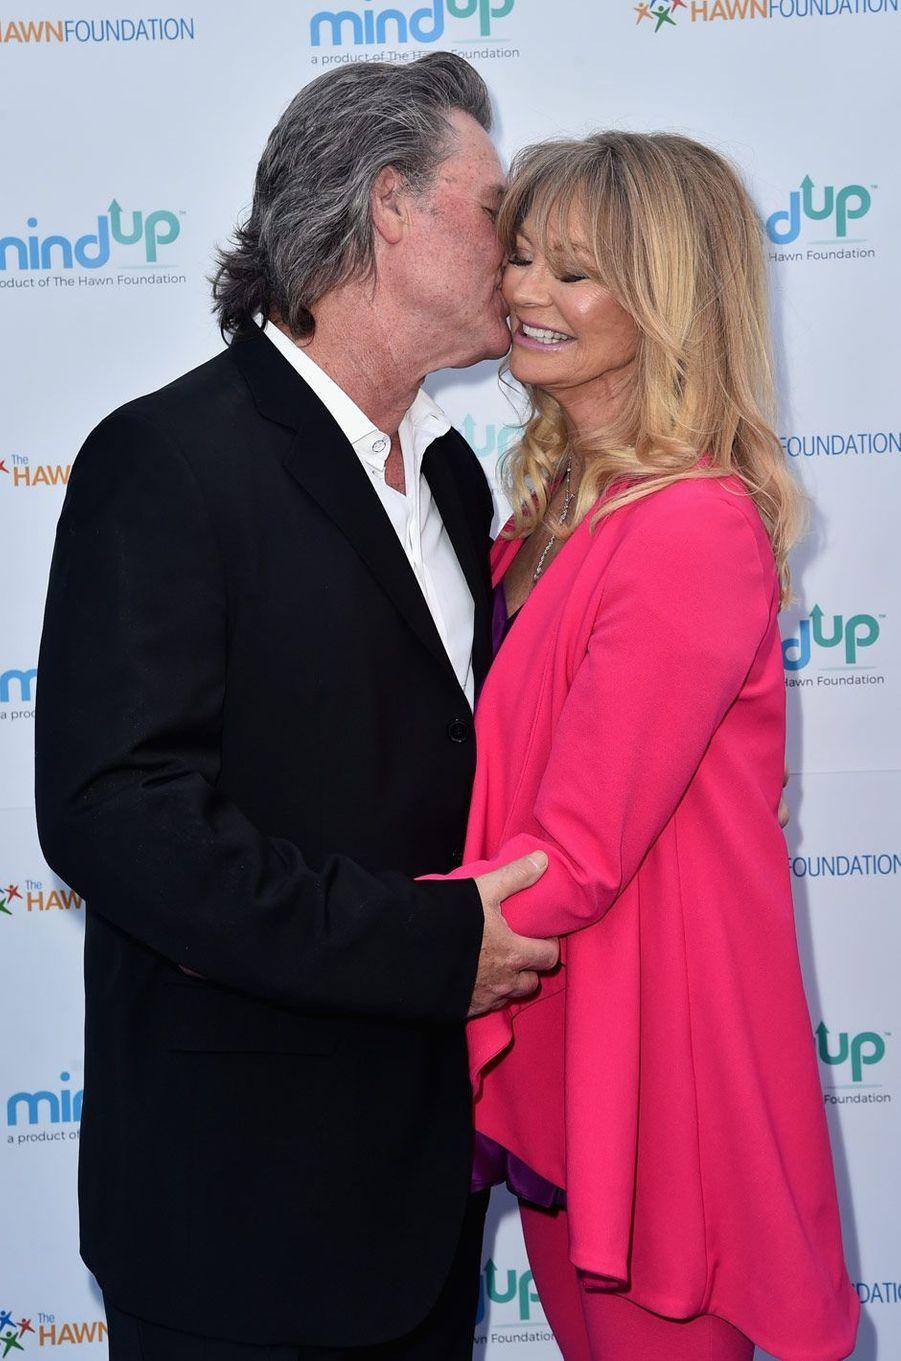 Moment de tendresse entre Kurt Russell et Goldie Hawn